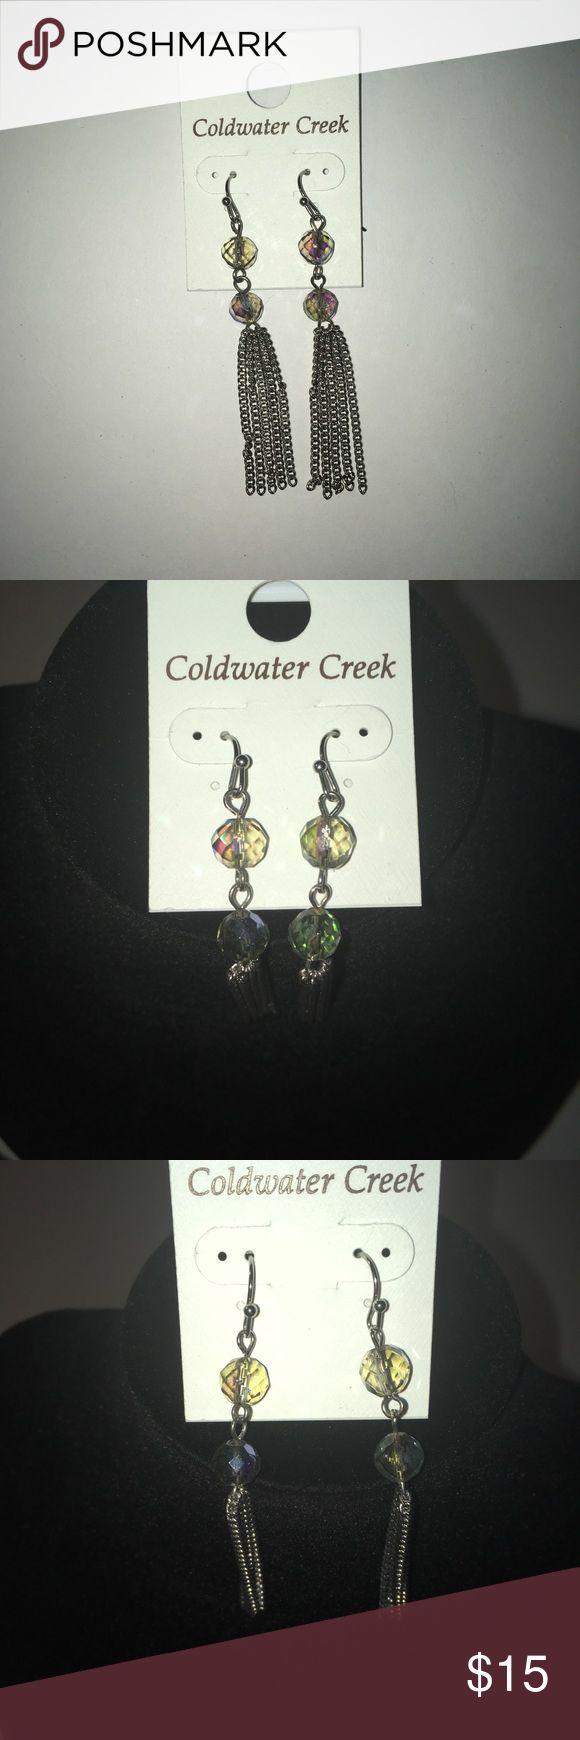 Coldwater Creek Earrings Coldwater Creek Crystaline Fringe Earrings  NWT Coldwater Creek Jewelry Earrings